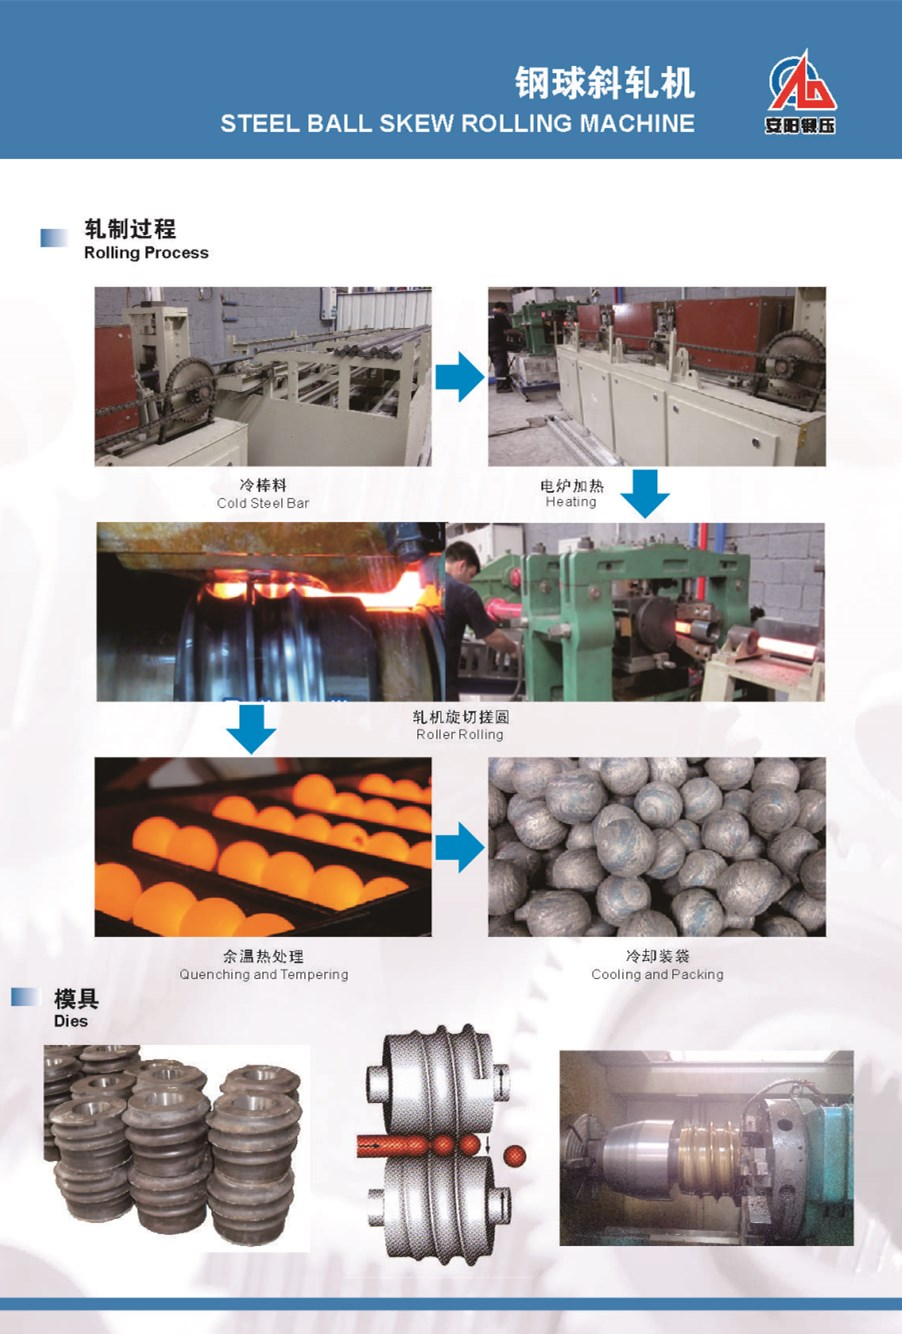 Skew rolling machine for grinding balls _Anyang Forging Press